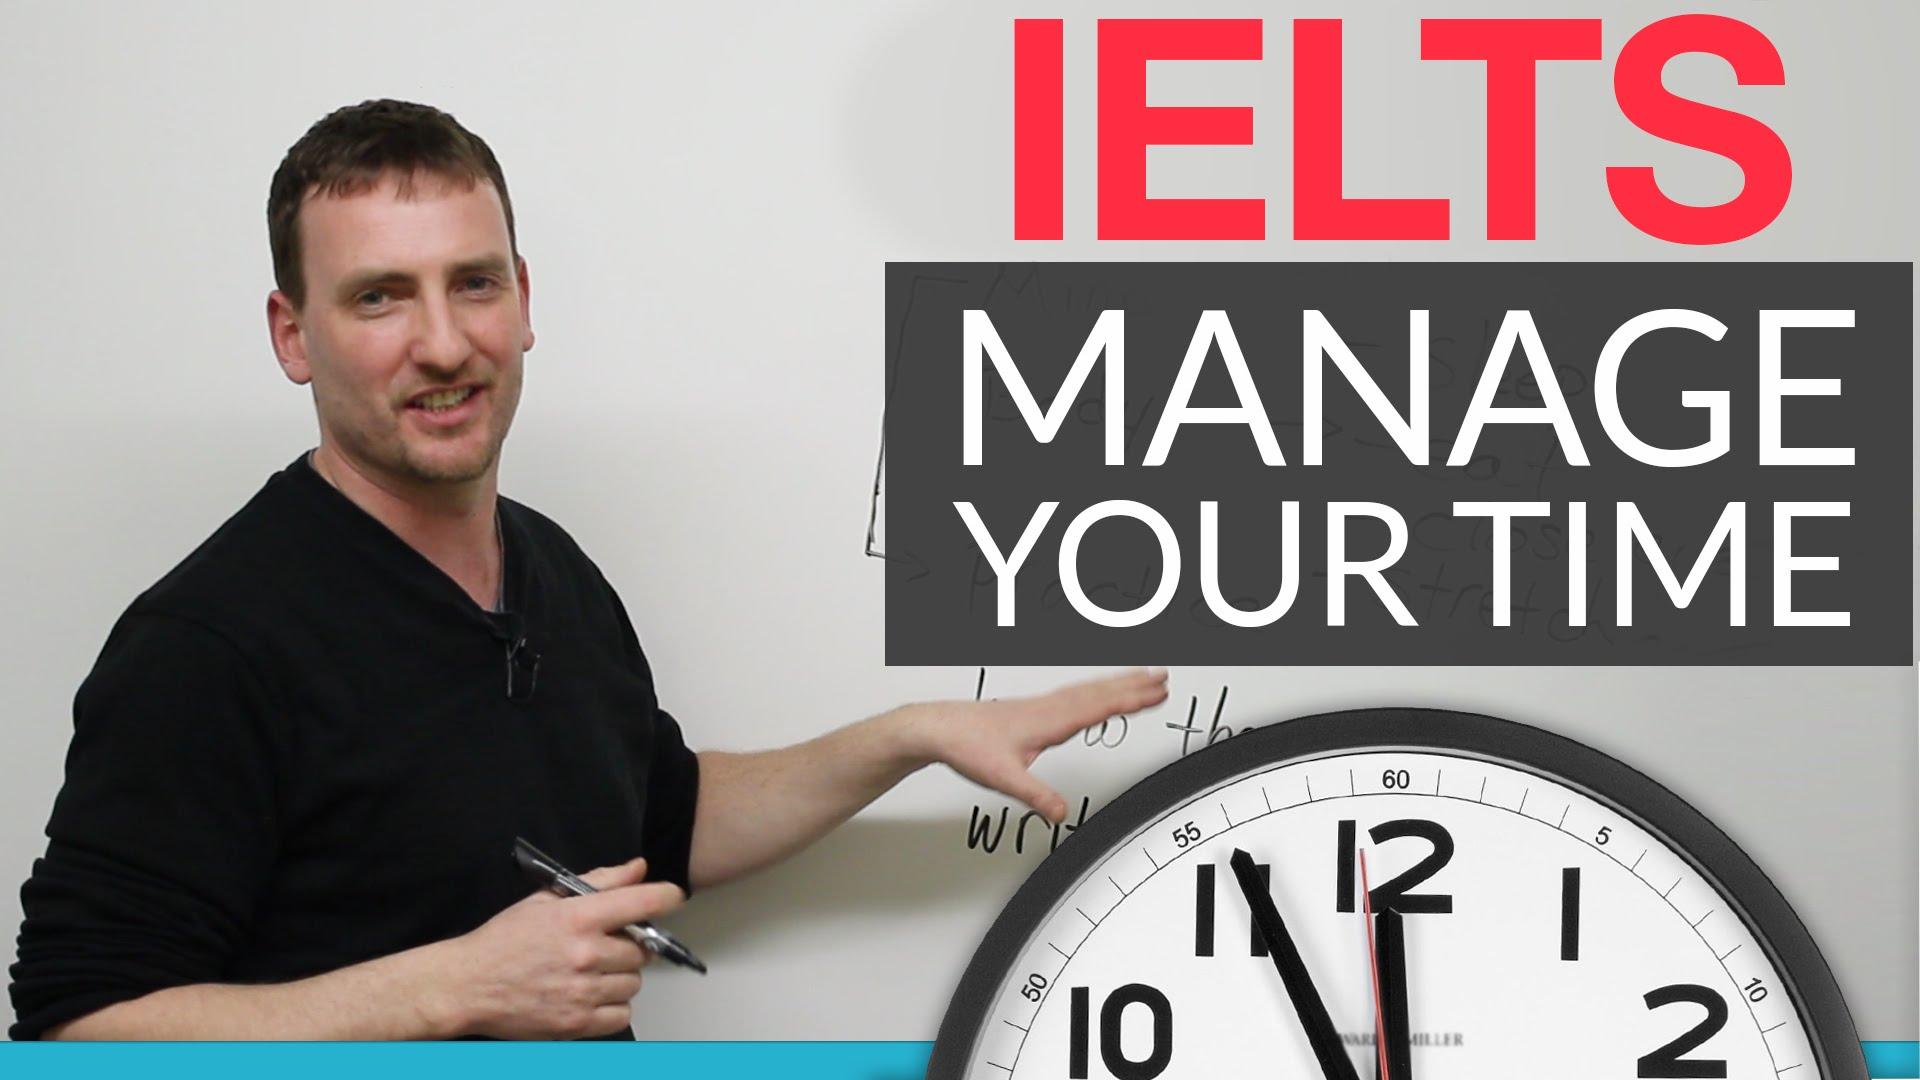 Writing Tips ที่จะทำให้คุณปลื้มผลคะแนนการสอบเขียน IELTS